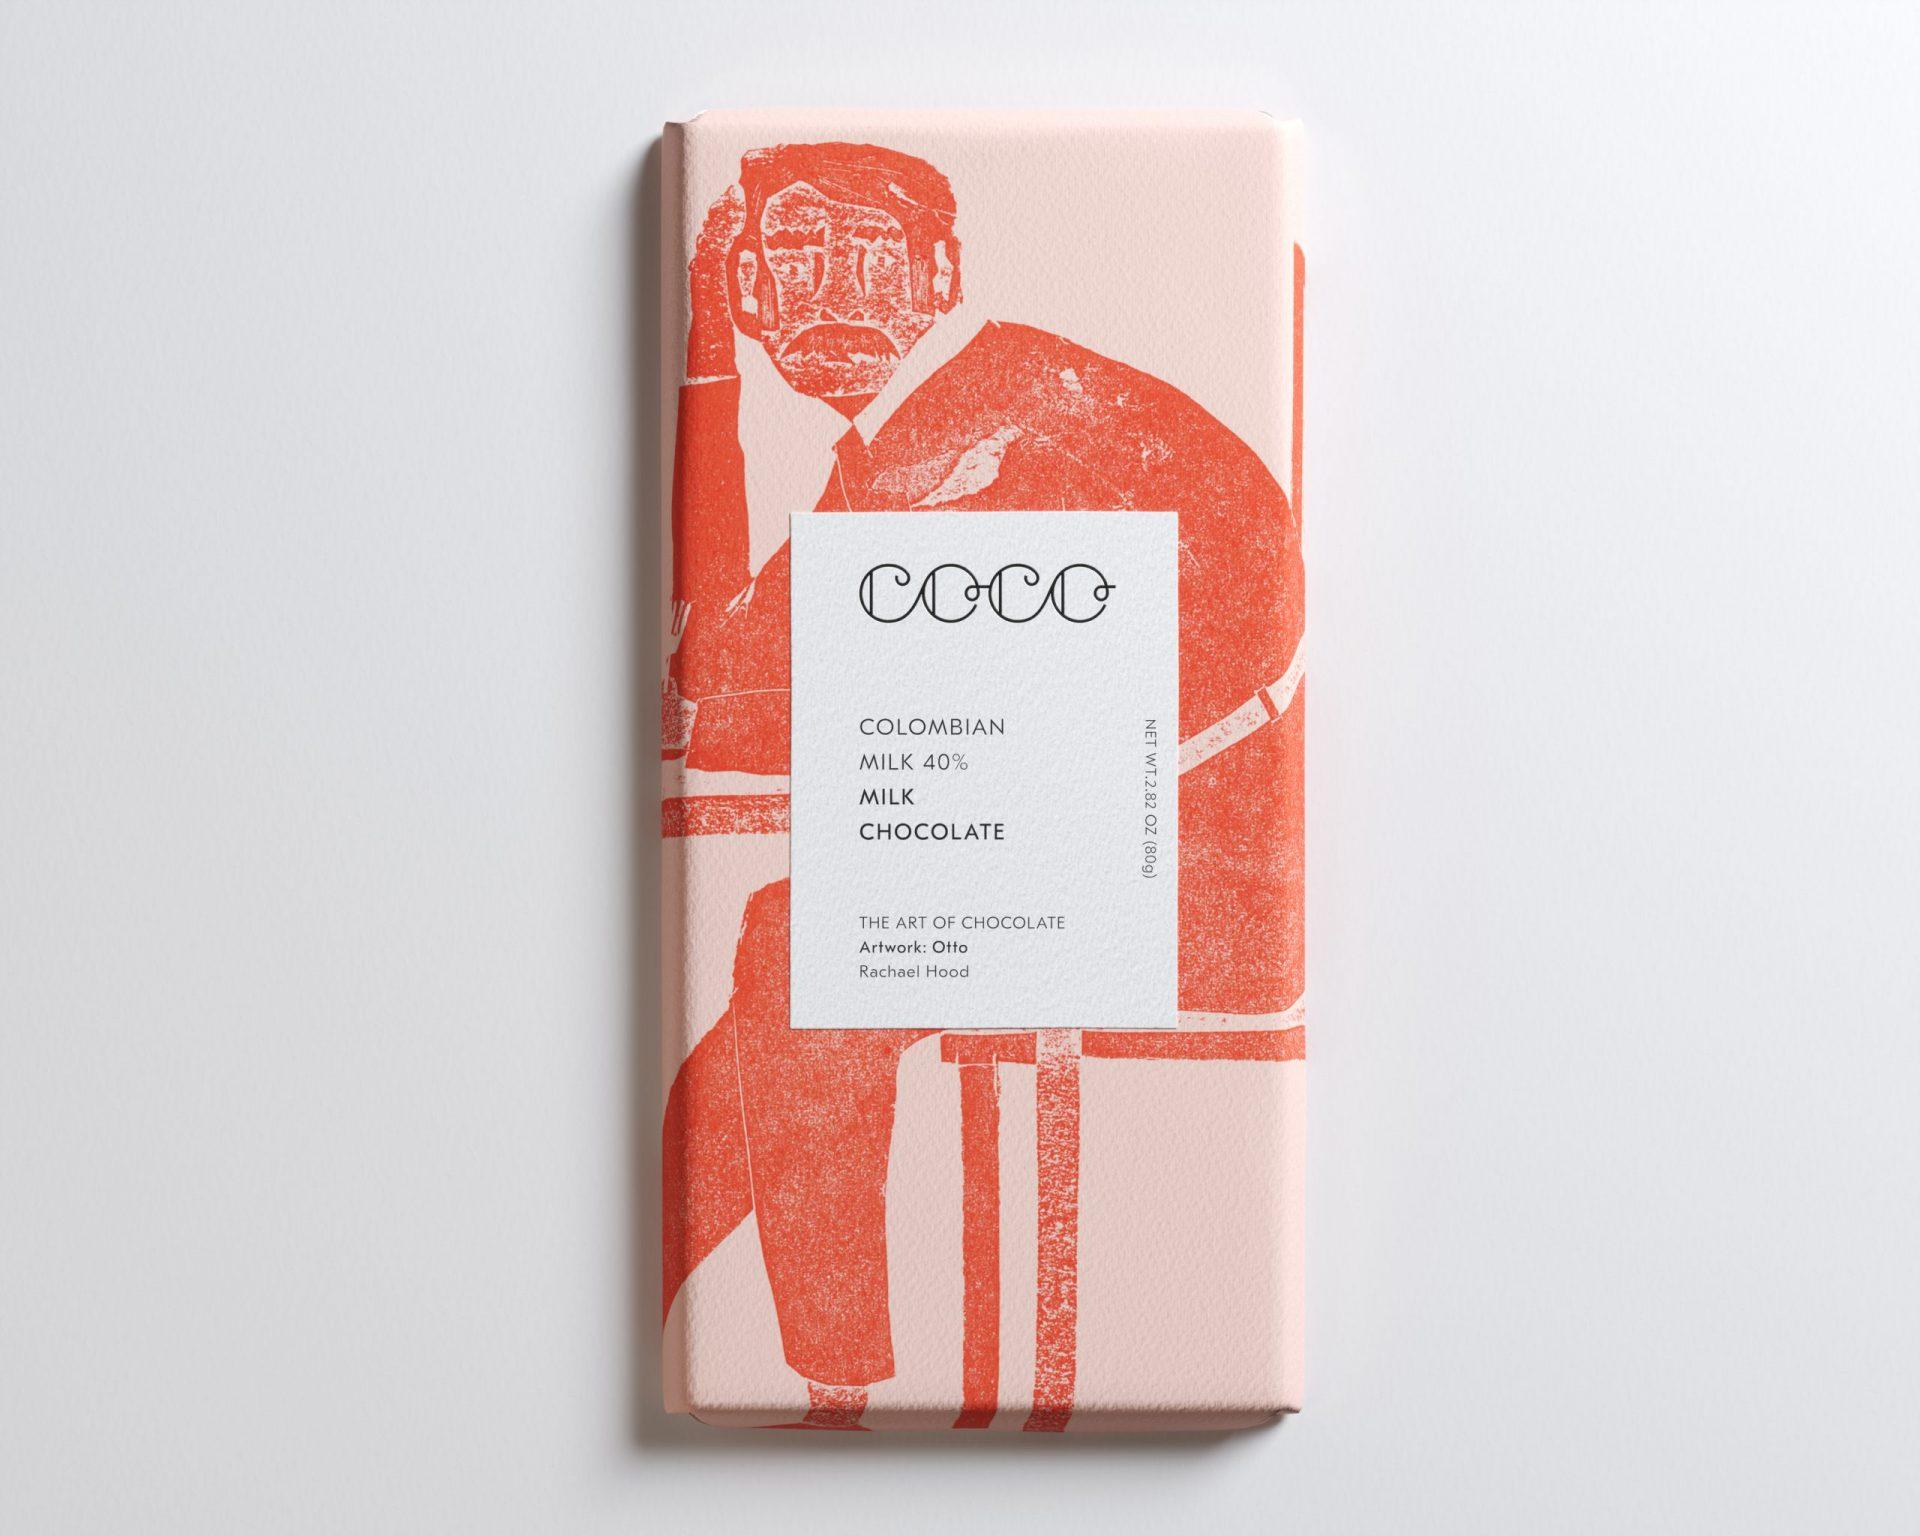 Coco Chocolatier Colombian Milk 40%